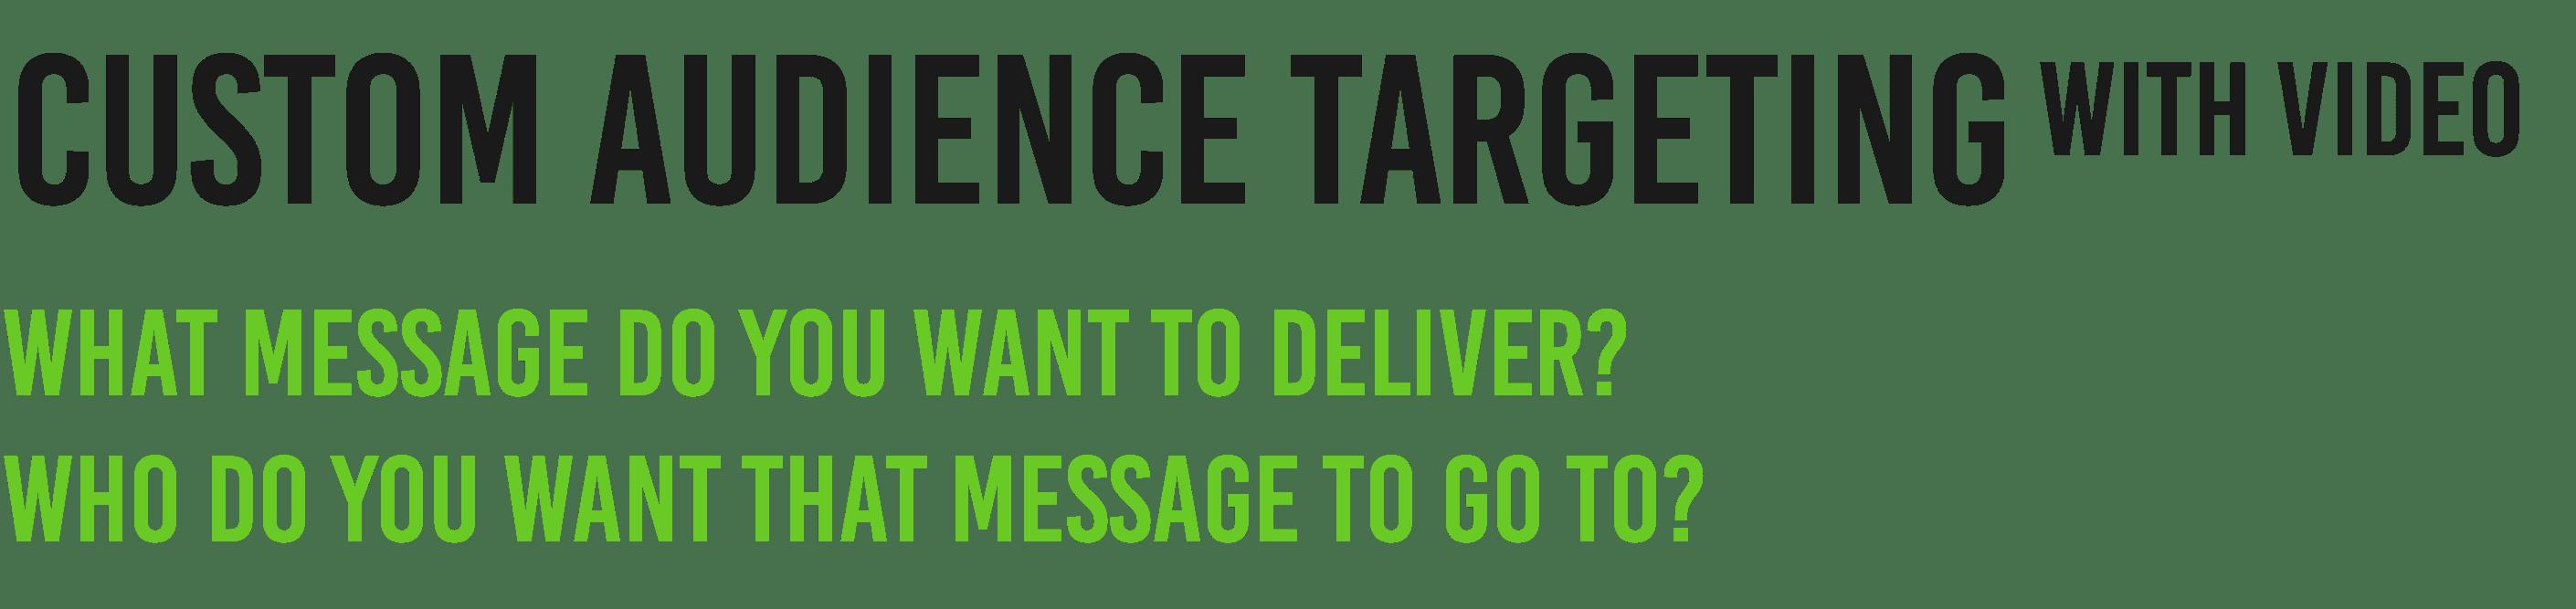 custom audience targeting with video